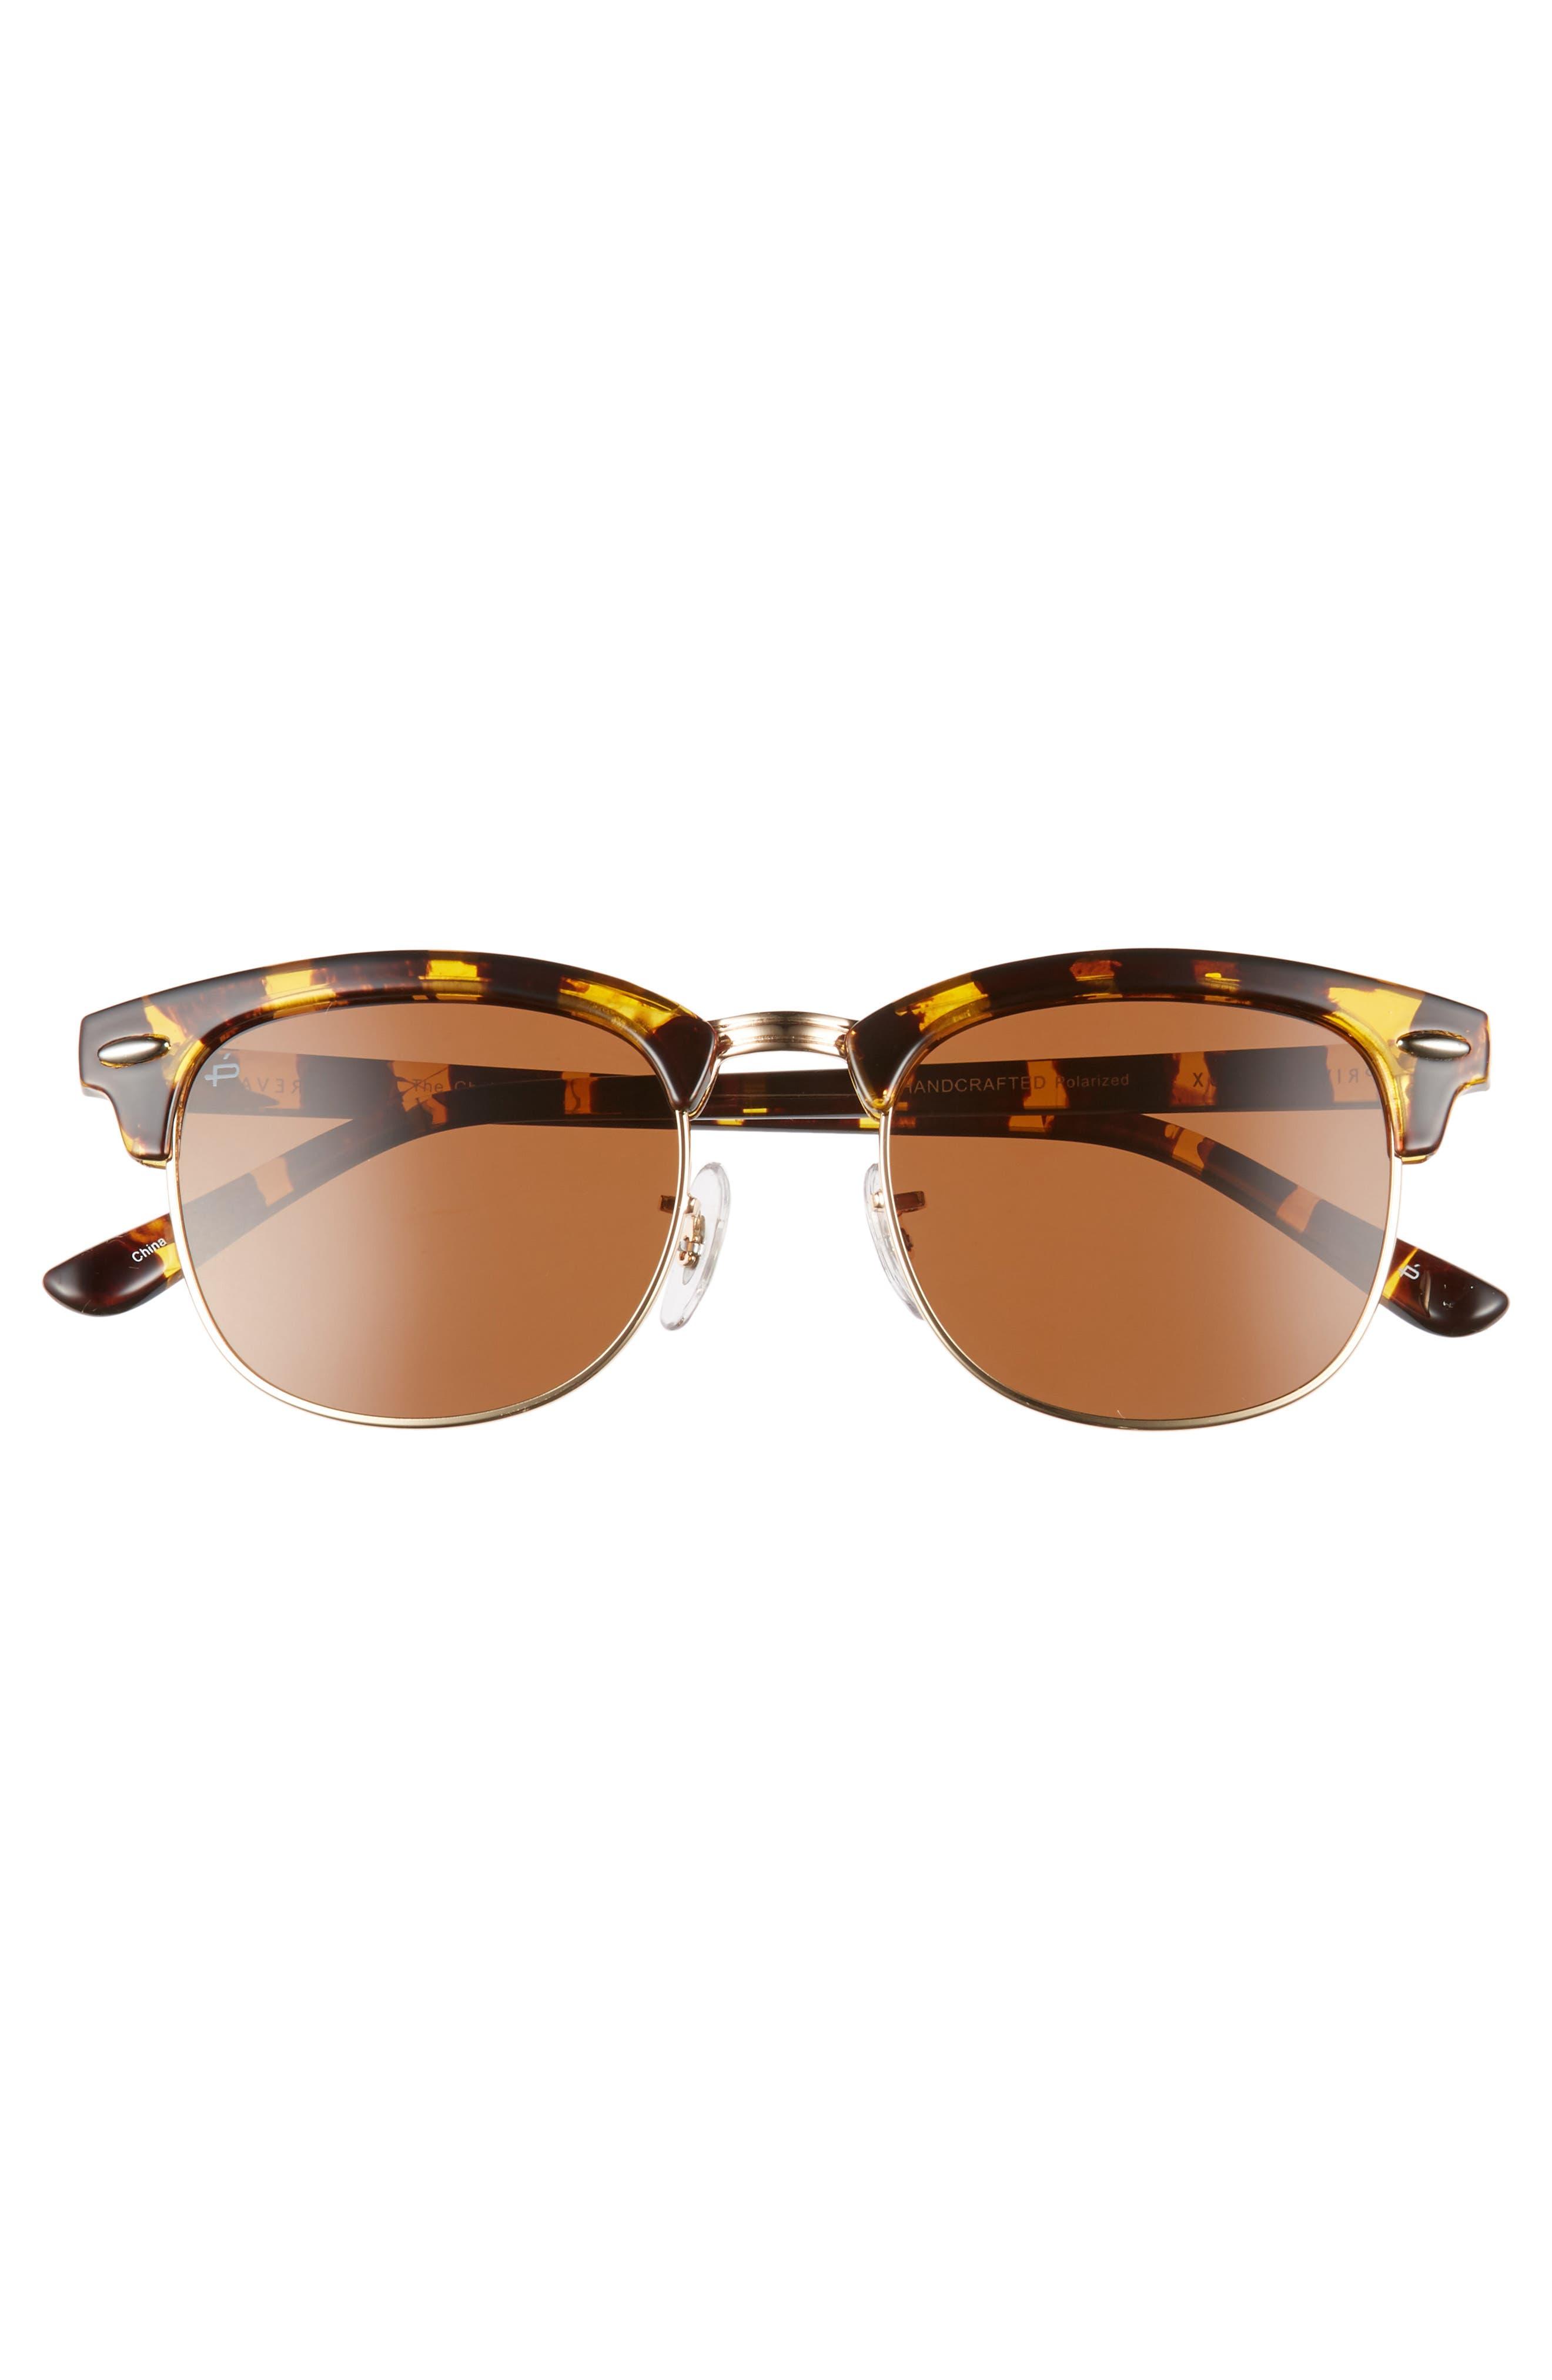 Privé Revaux The Chairman 52mm Polarized Browline Sunglasses,                             Alternate thumbnail 4, color,